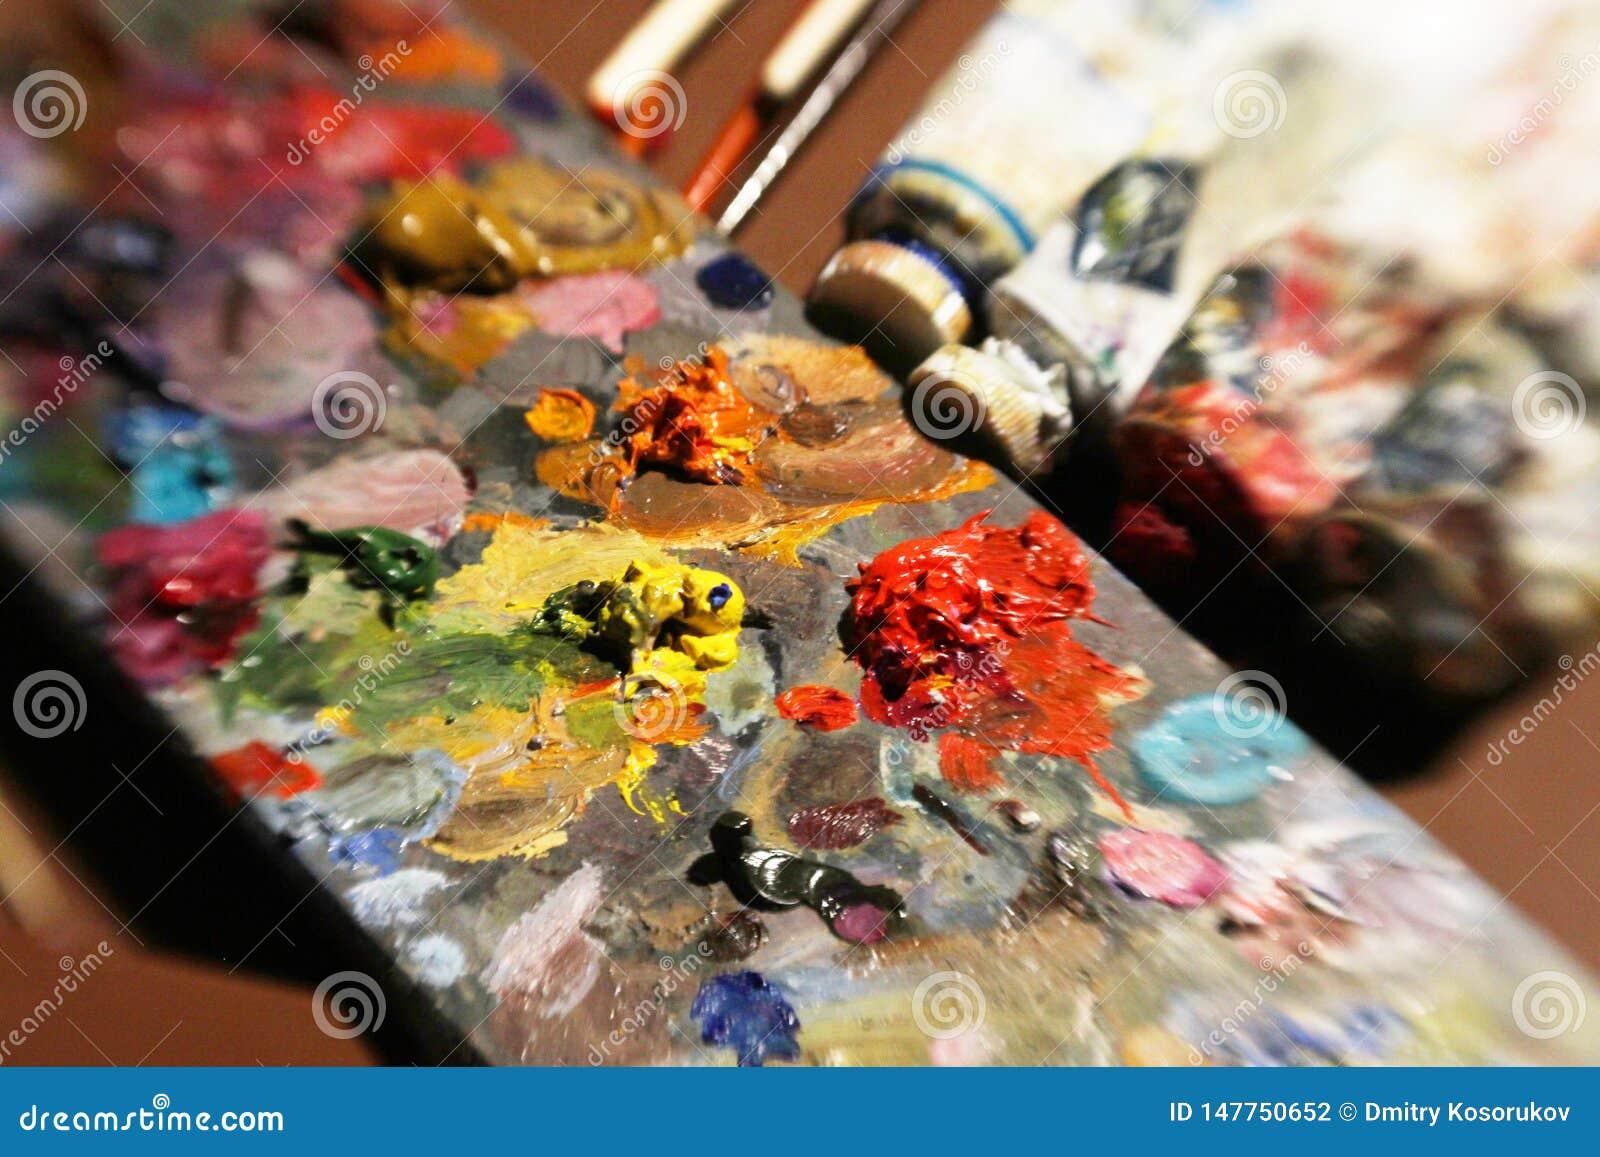 Artigos a pintar com pinturas de óleo